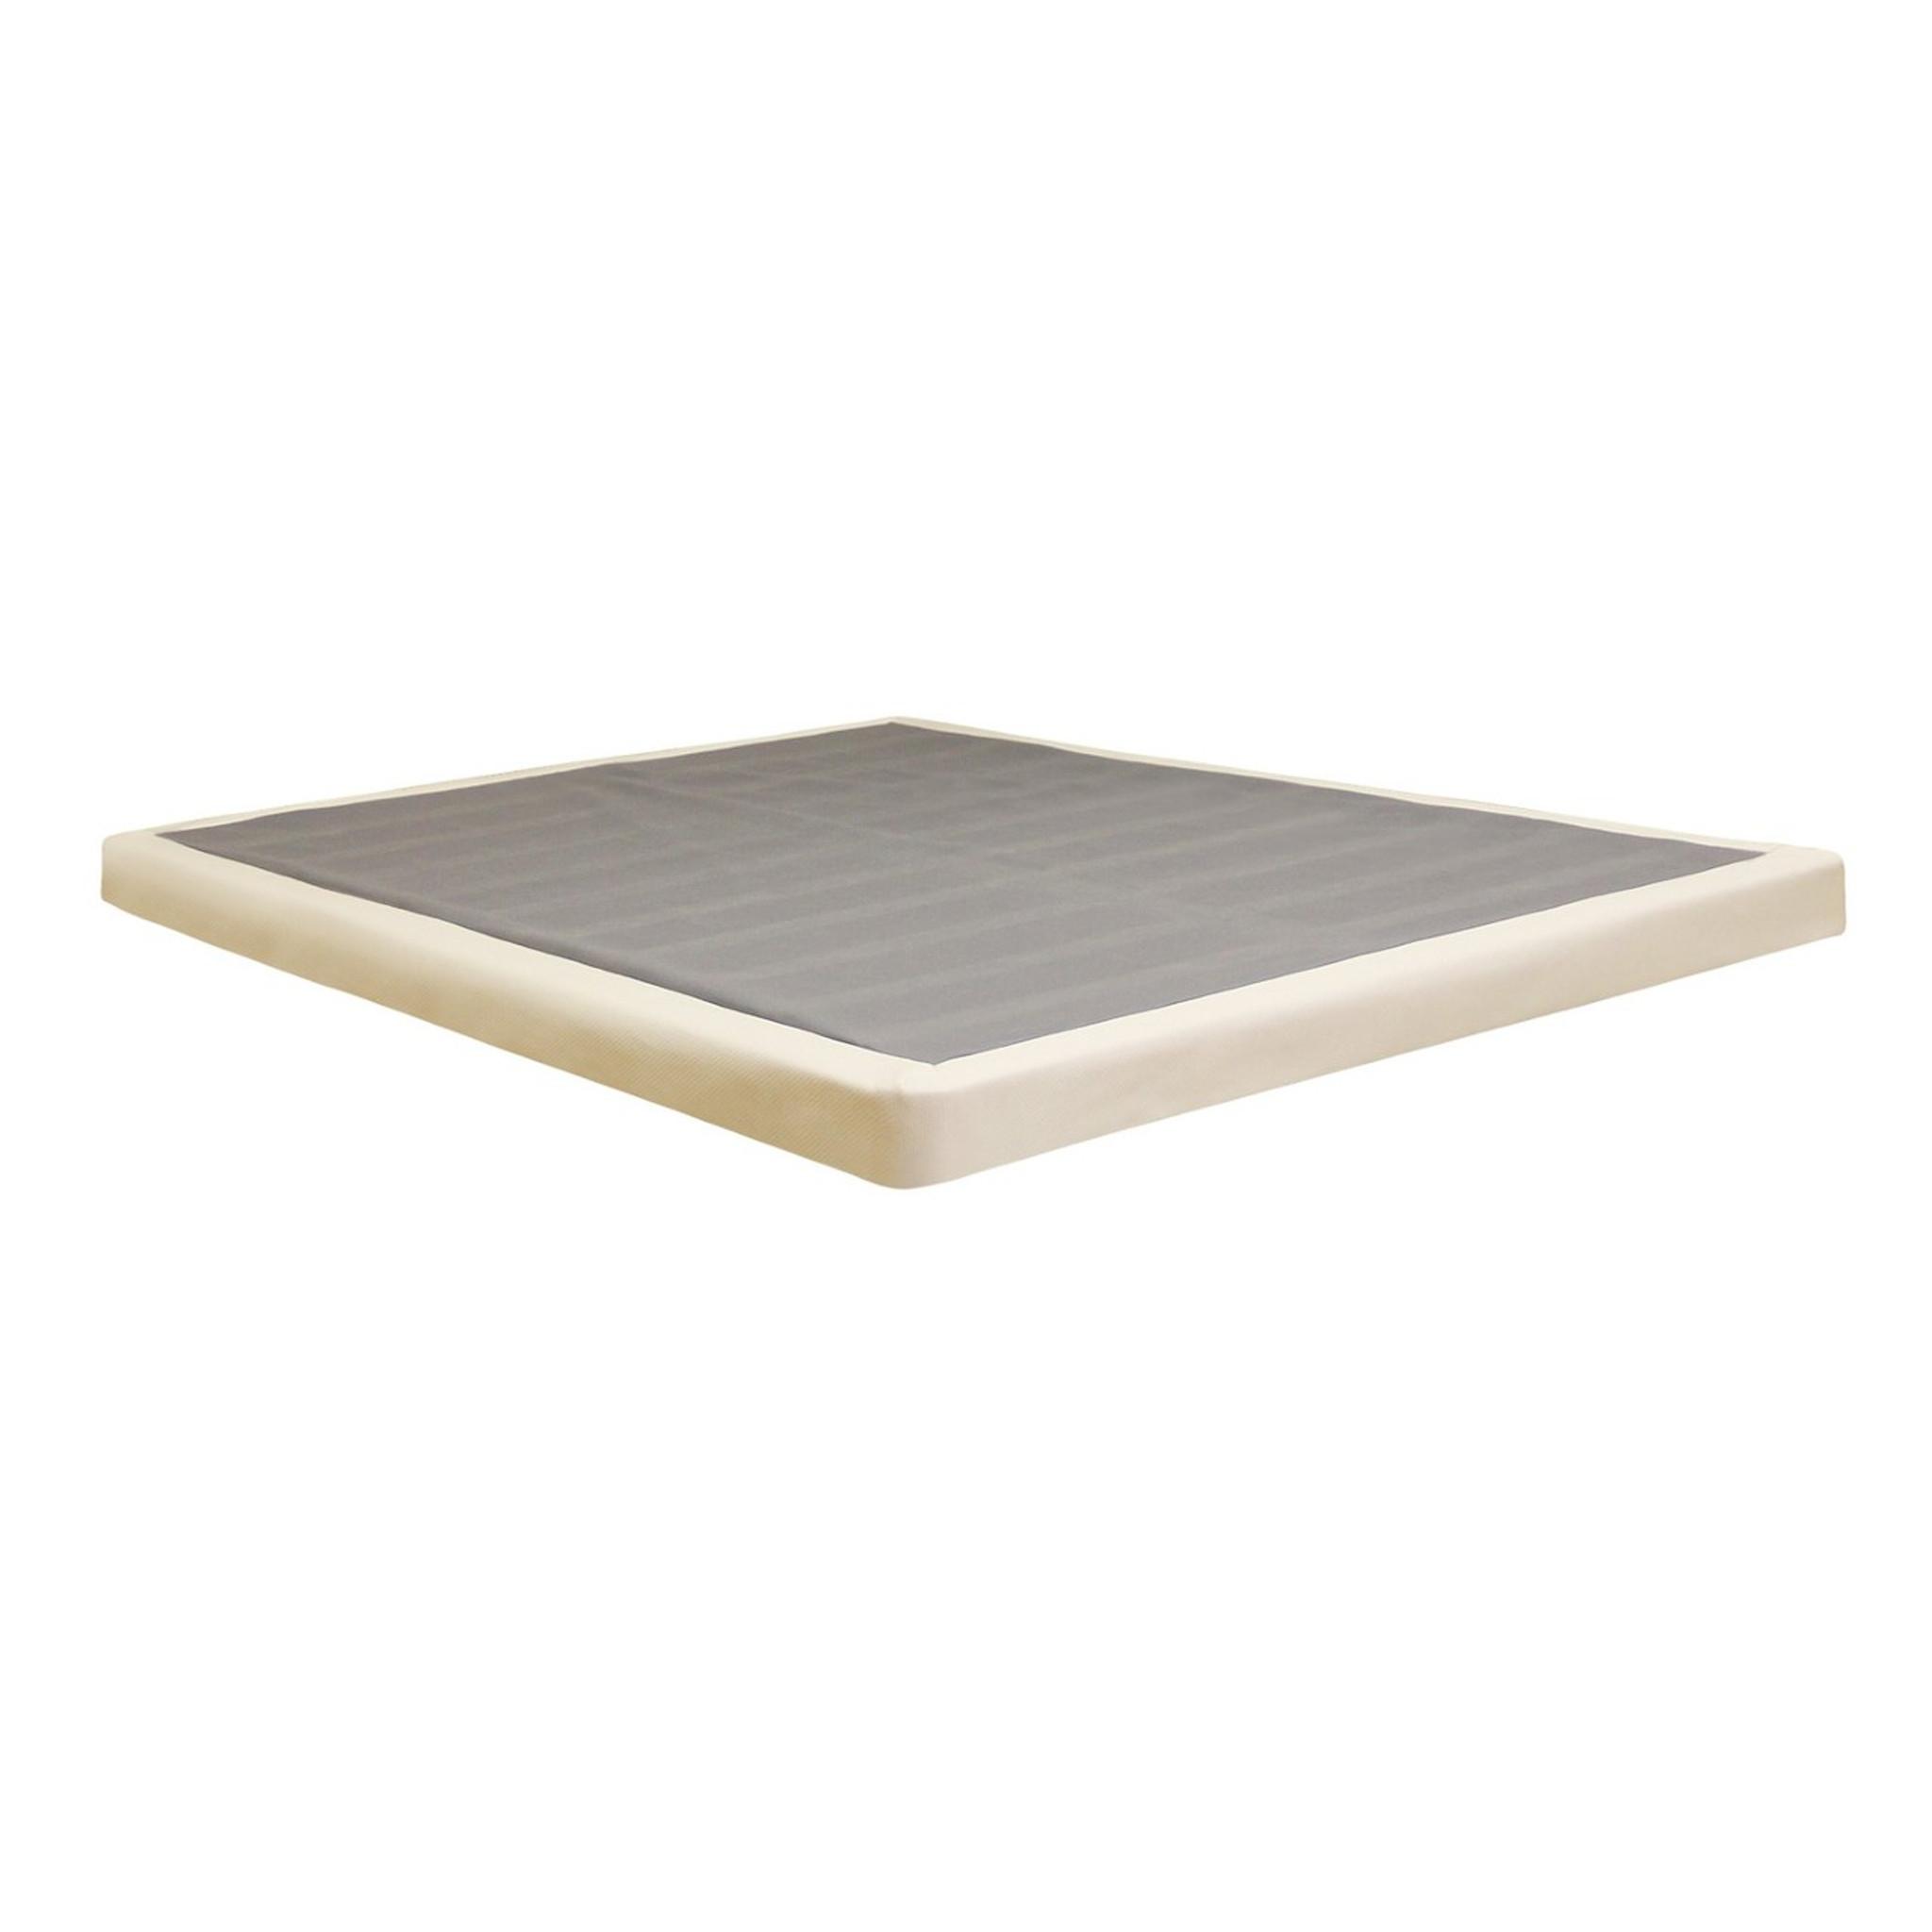 Modern Sleep 4 Low Profile Mattress Foundation Box Spring Km Home Furniture